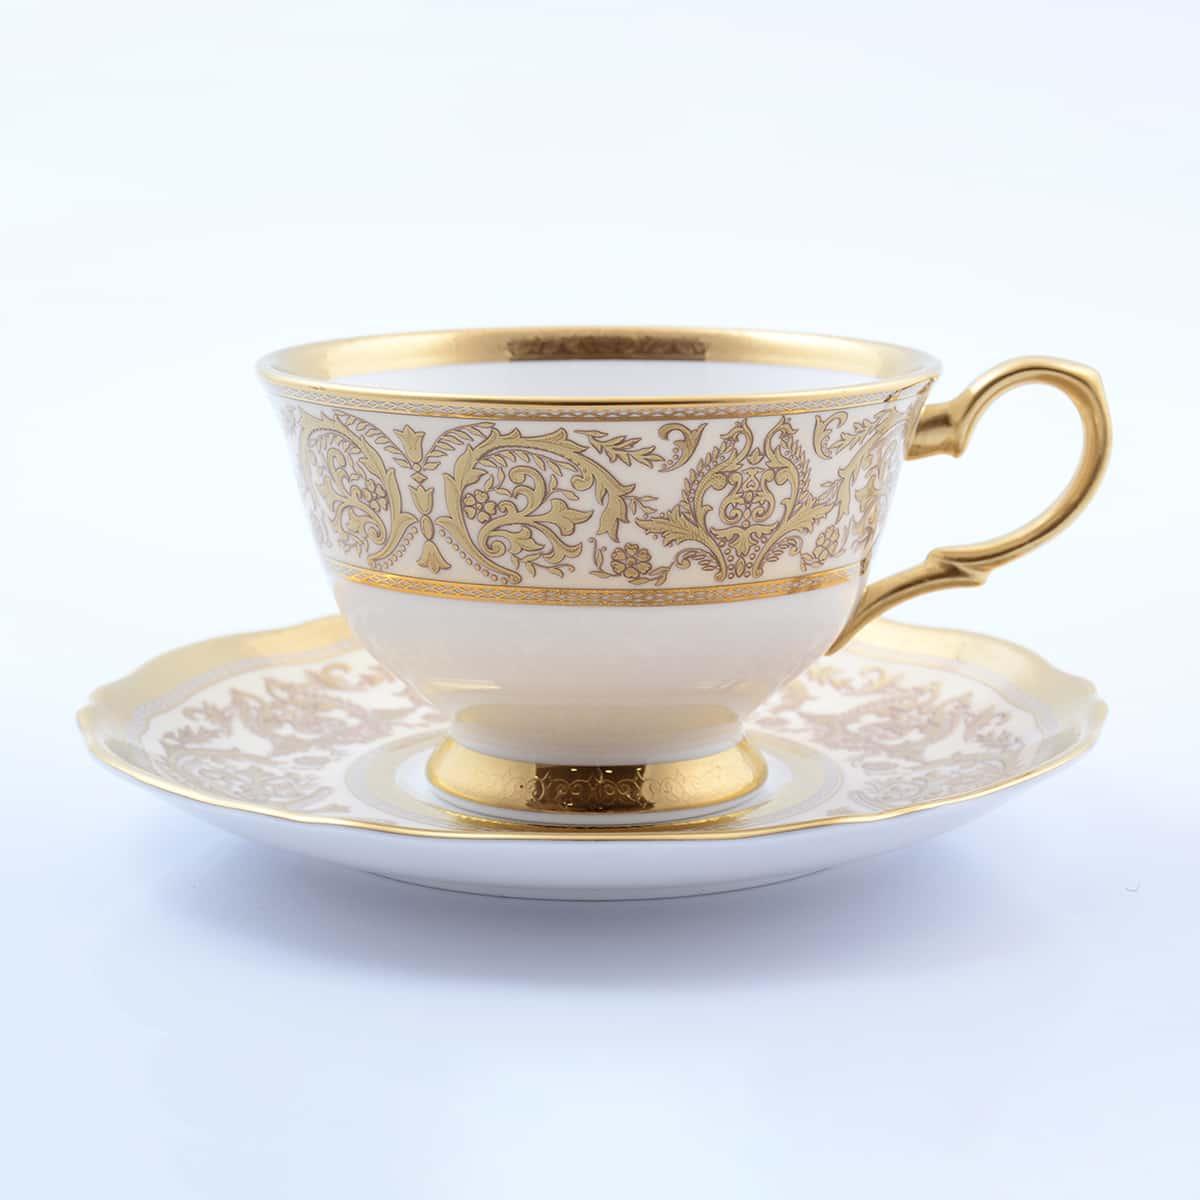 Набор чайных пар 220мл Golden Romance Cream Gold Prouna (6 пар)